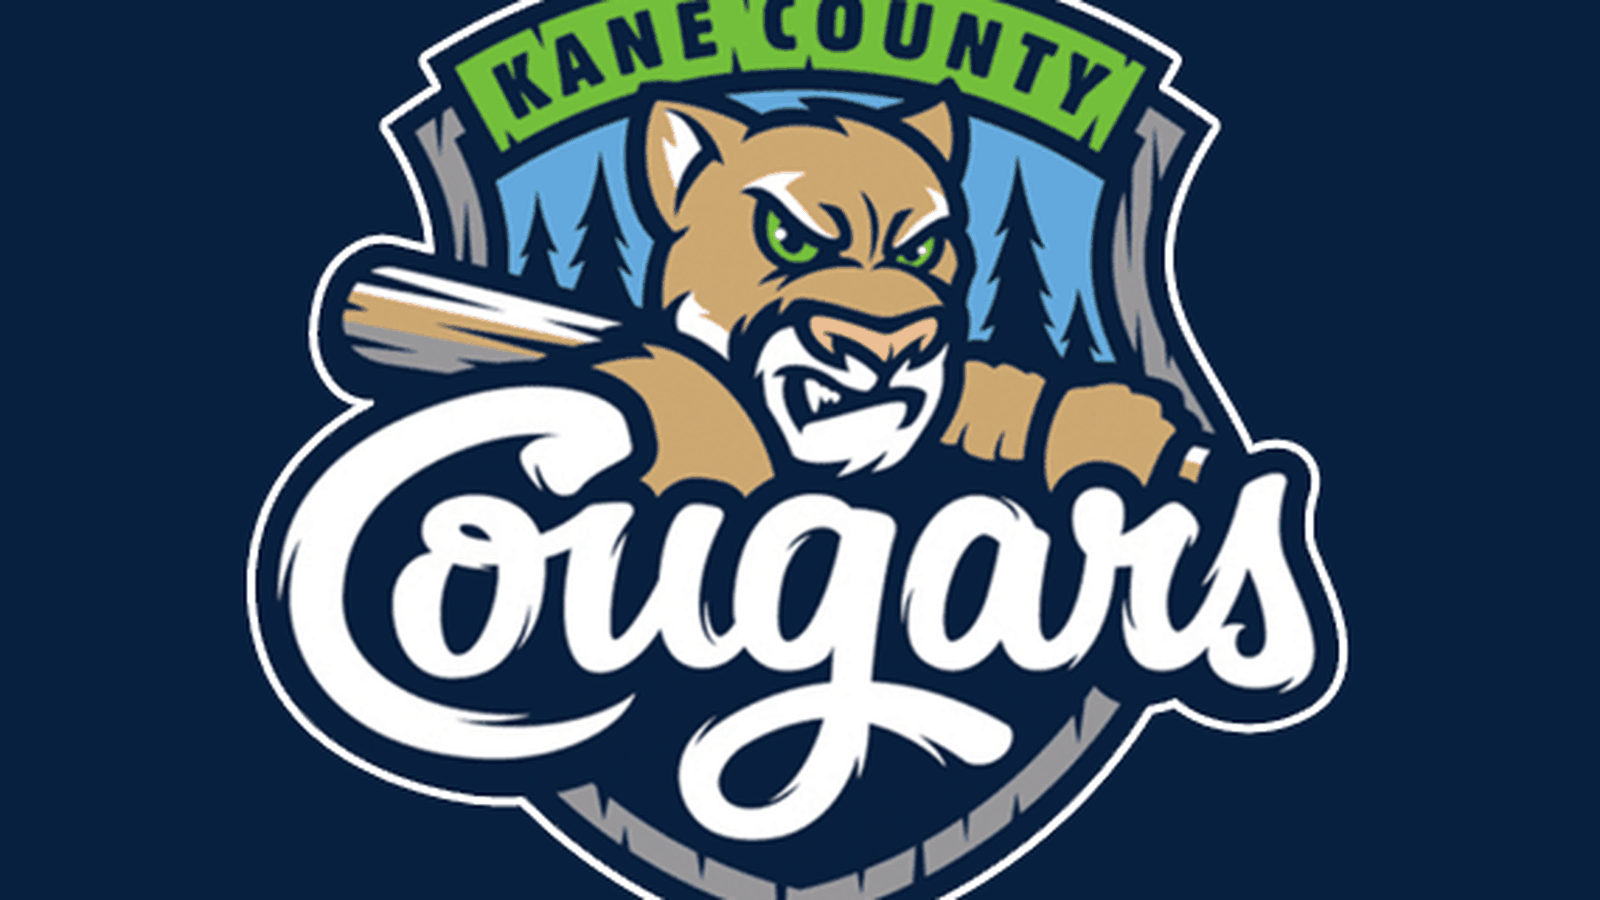 Kccougers_new_logo.0